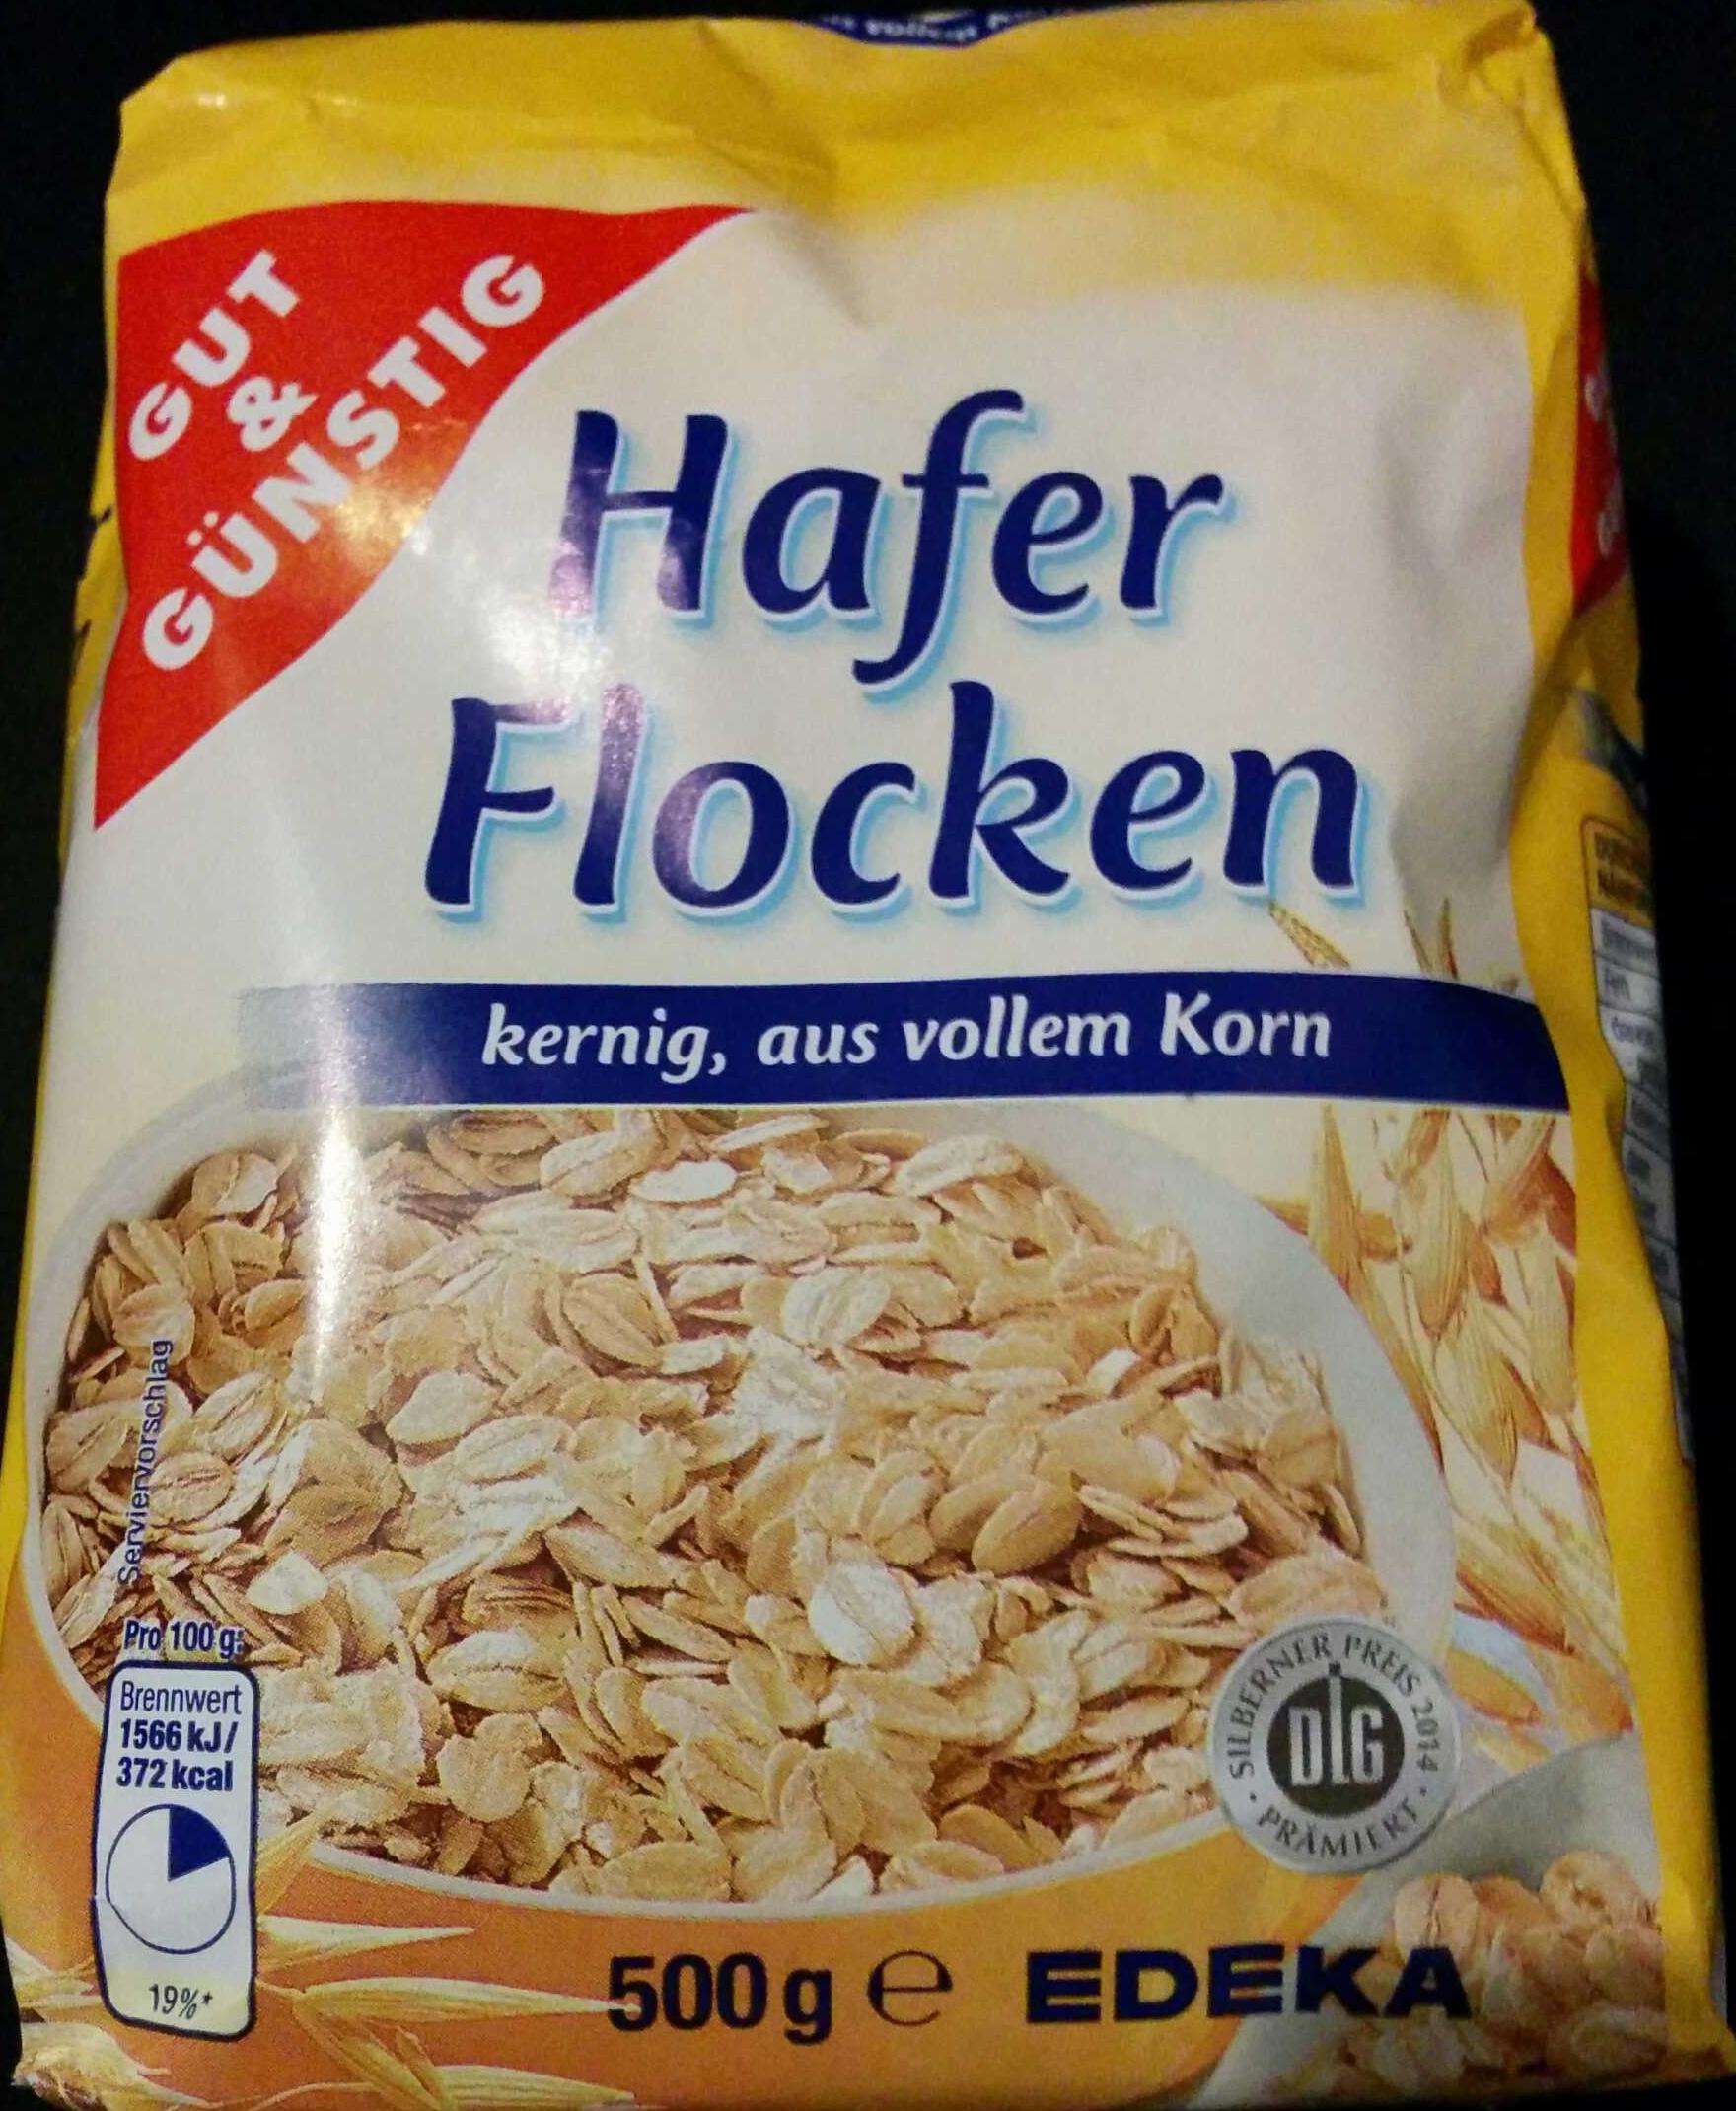 Haferflocken - Product - de